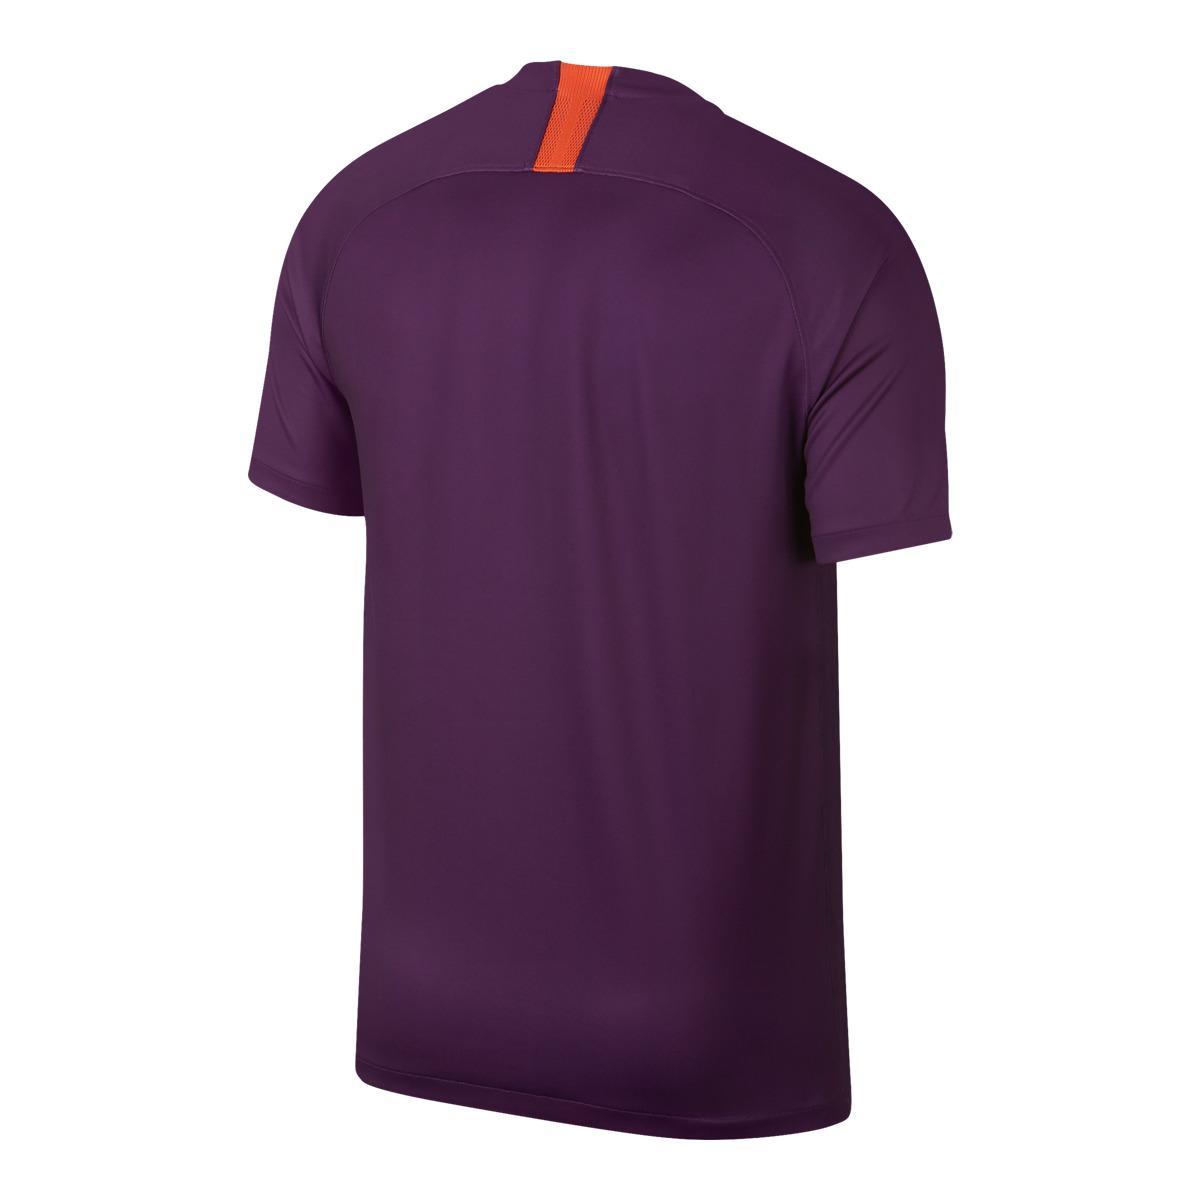 15e61601c5f Nike - Purple Manchester City Fc 2018-2019 Breathe Stadium Third Kit Shirt  for Men. View fullscreen